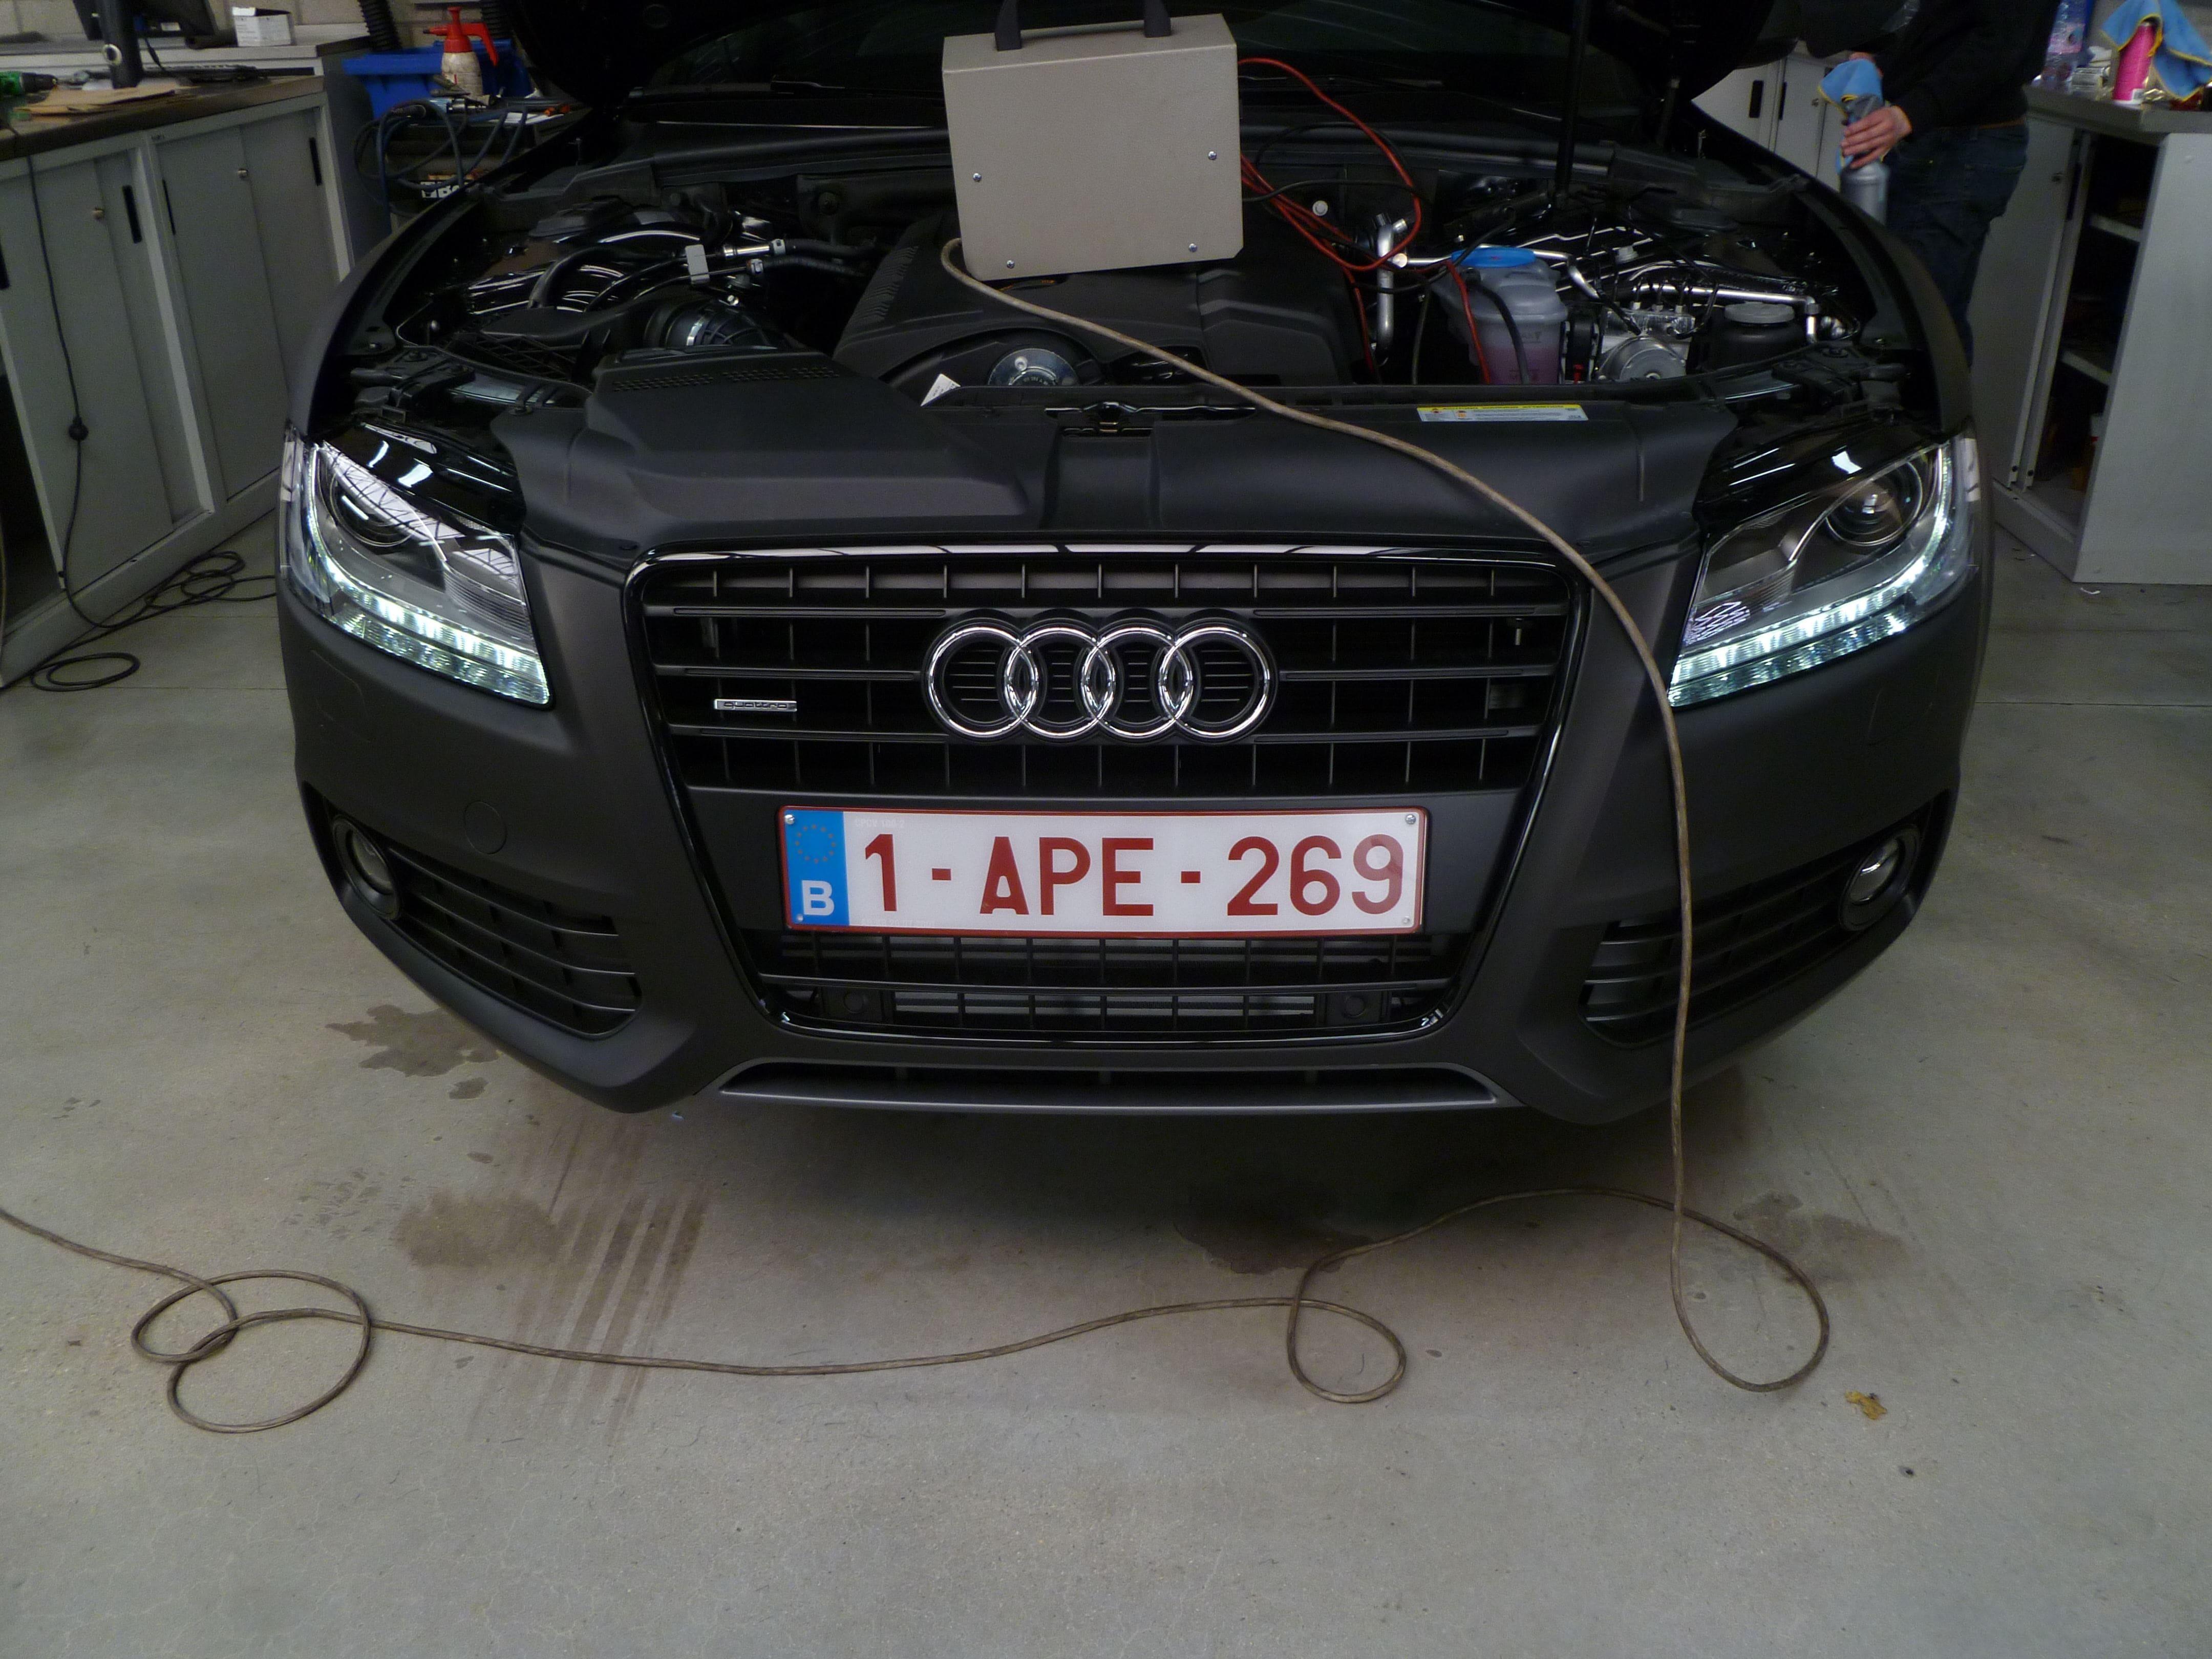 Audi A5 Coupe met Mat Zwarte Wrap, Carwrapping door Wrapmyride.nu Foto-nr:4648, ©2021